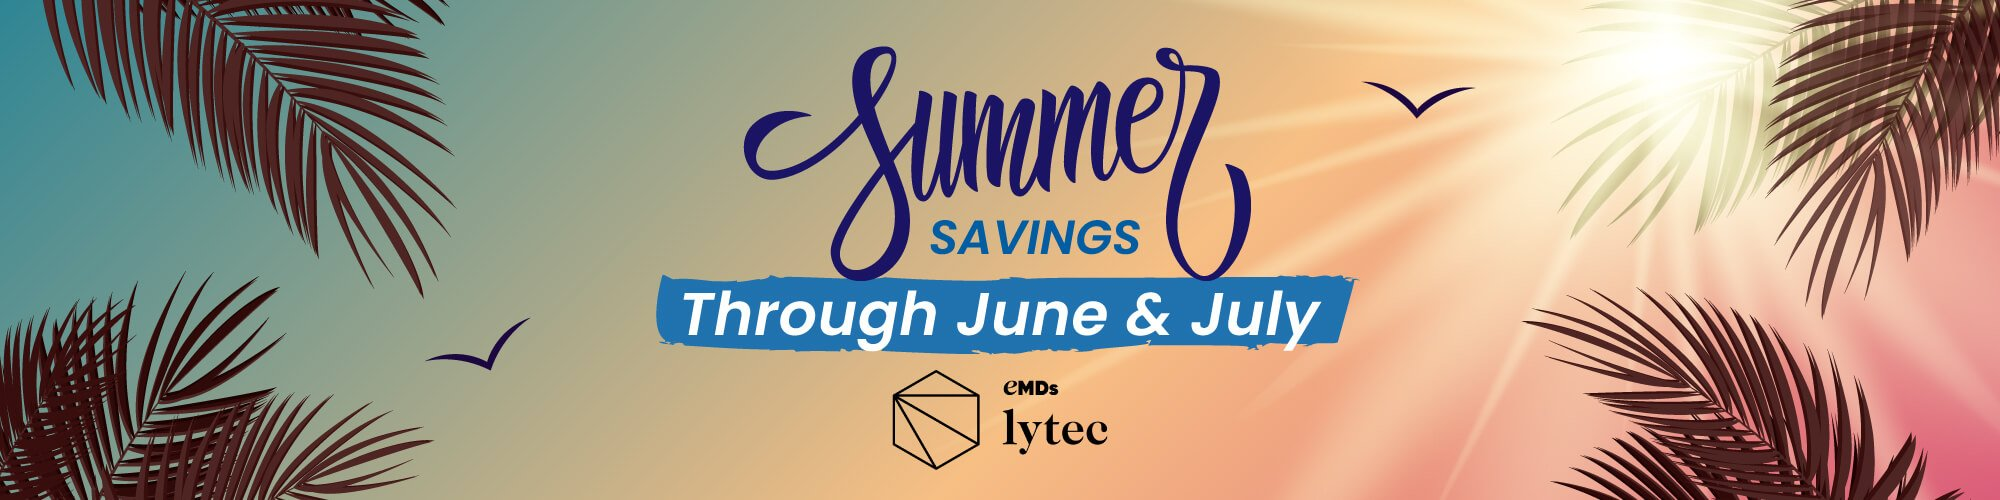 Lytec 2021 summer sales event